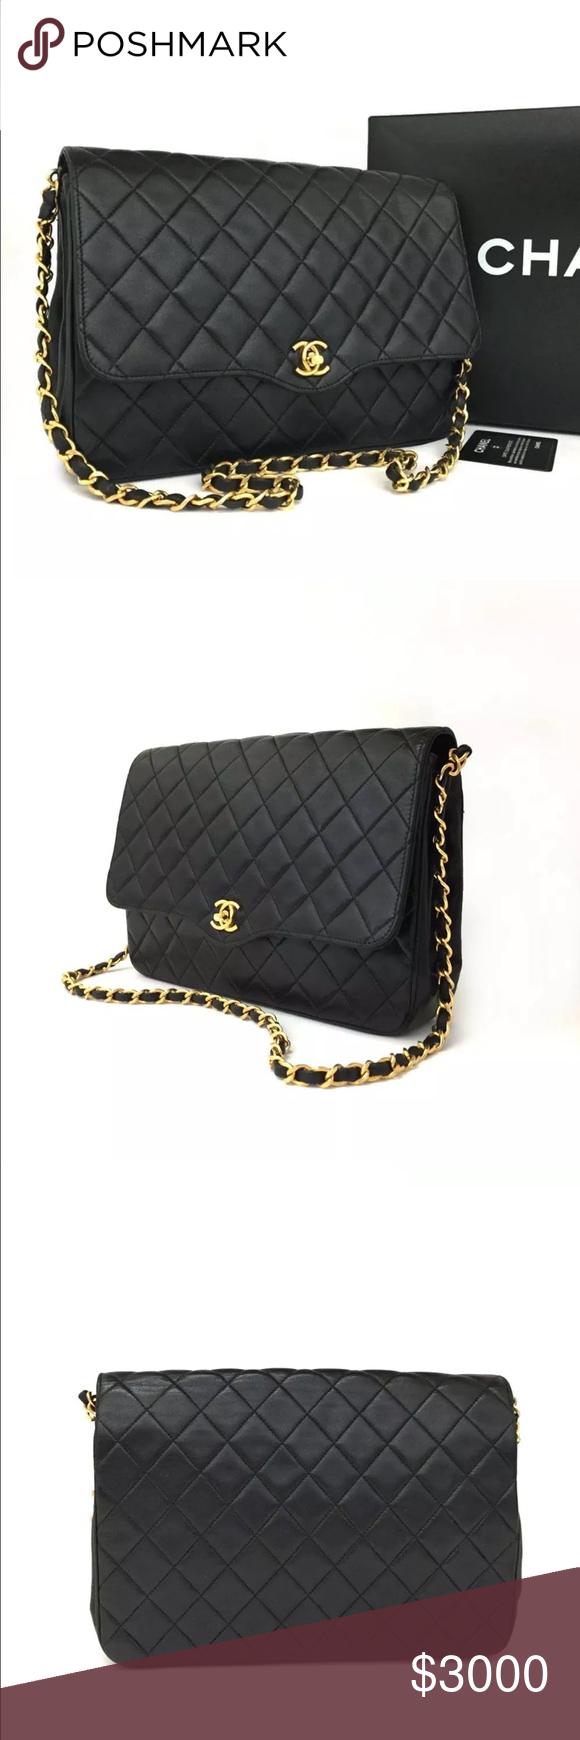 Chanel cc logo matelasse lambskin shoulder bag Serial Number   Date  Code:2009946 Authentic Vintage CHANEL Quilted Matelasse CC Logo Lambskin  Chain Shoulder ... 088985036455e